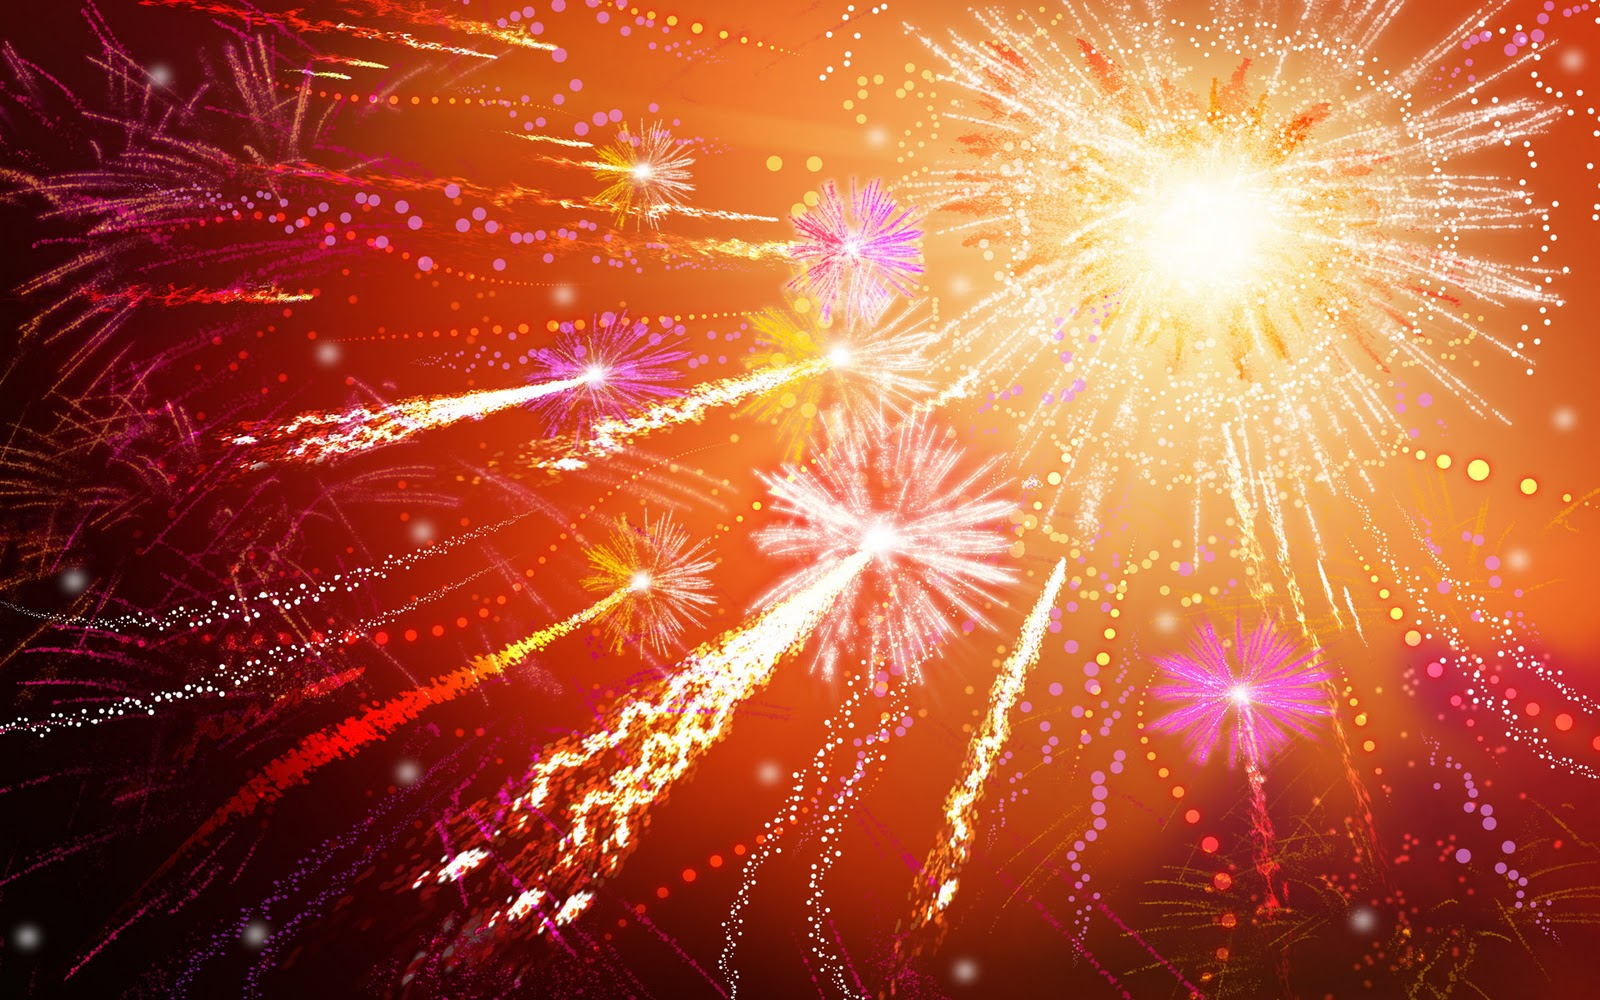 http://1.bp.blogspot.com/_NtIHJCd4BU4/TTAZjr9NbwI/AAAAAAAAALo/zrl3MMxGTWQ/s1600/Fireworks_1006.jpg